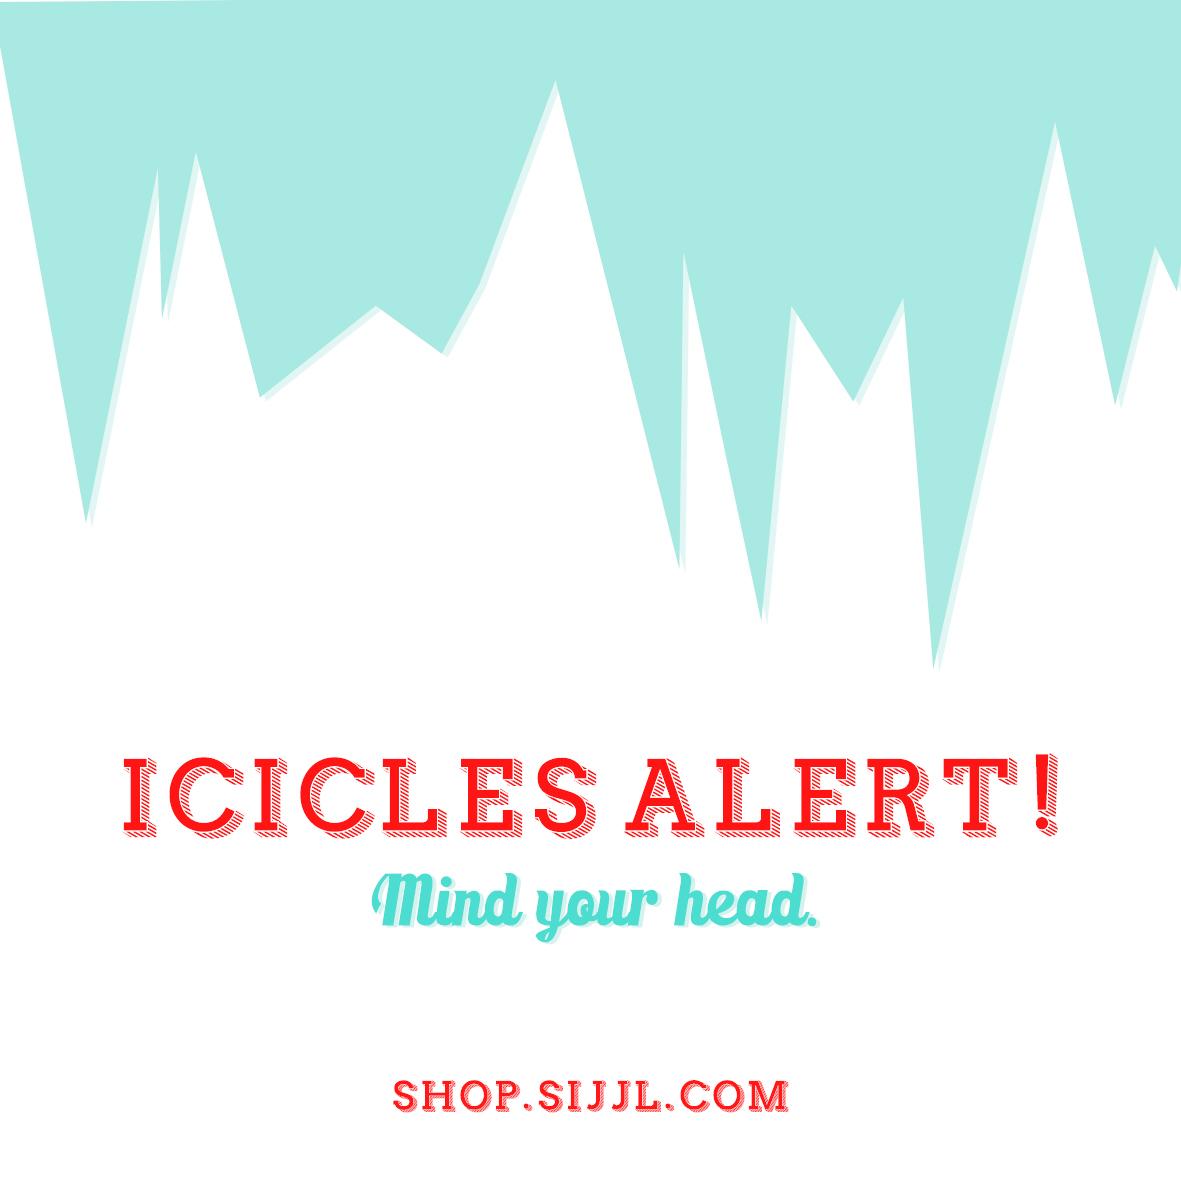 icicles alert